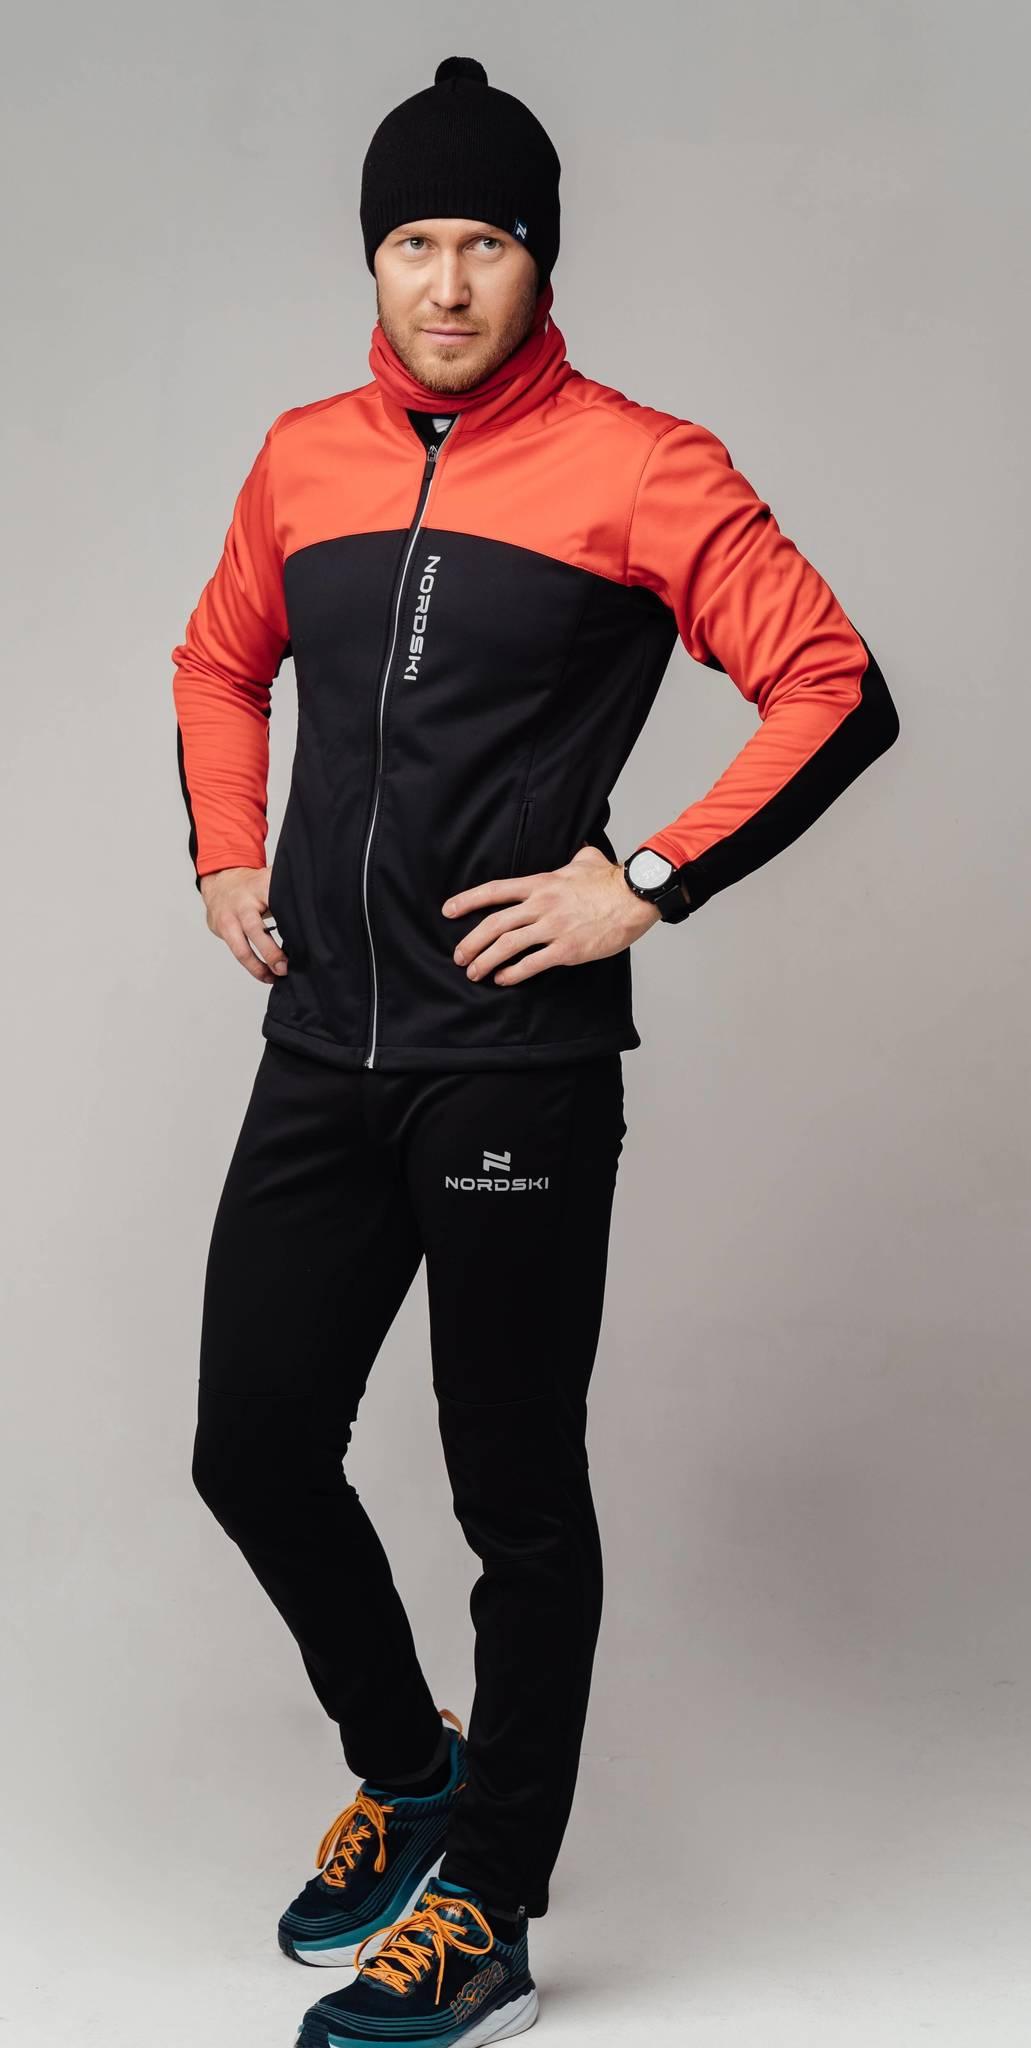 Nordski Jr Active Base детский беговой костюм red-black - 2